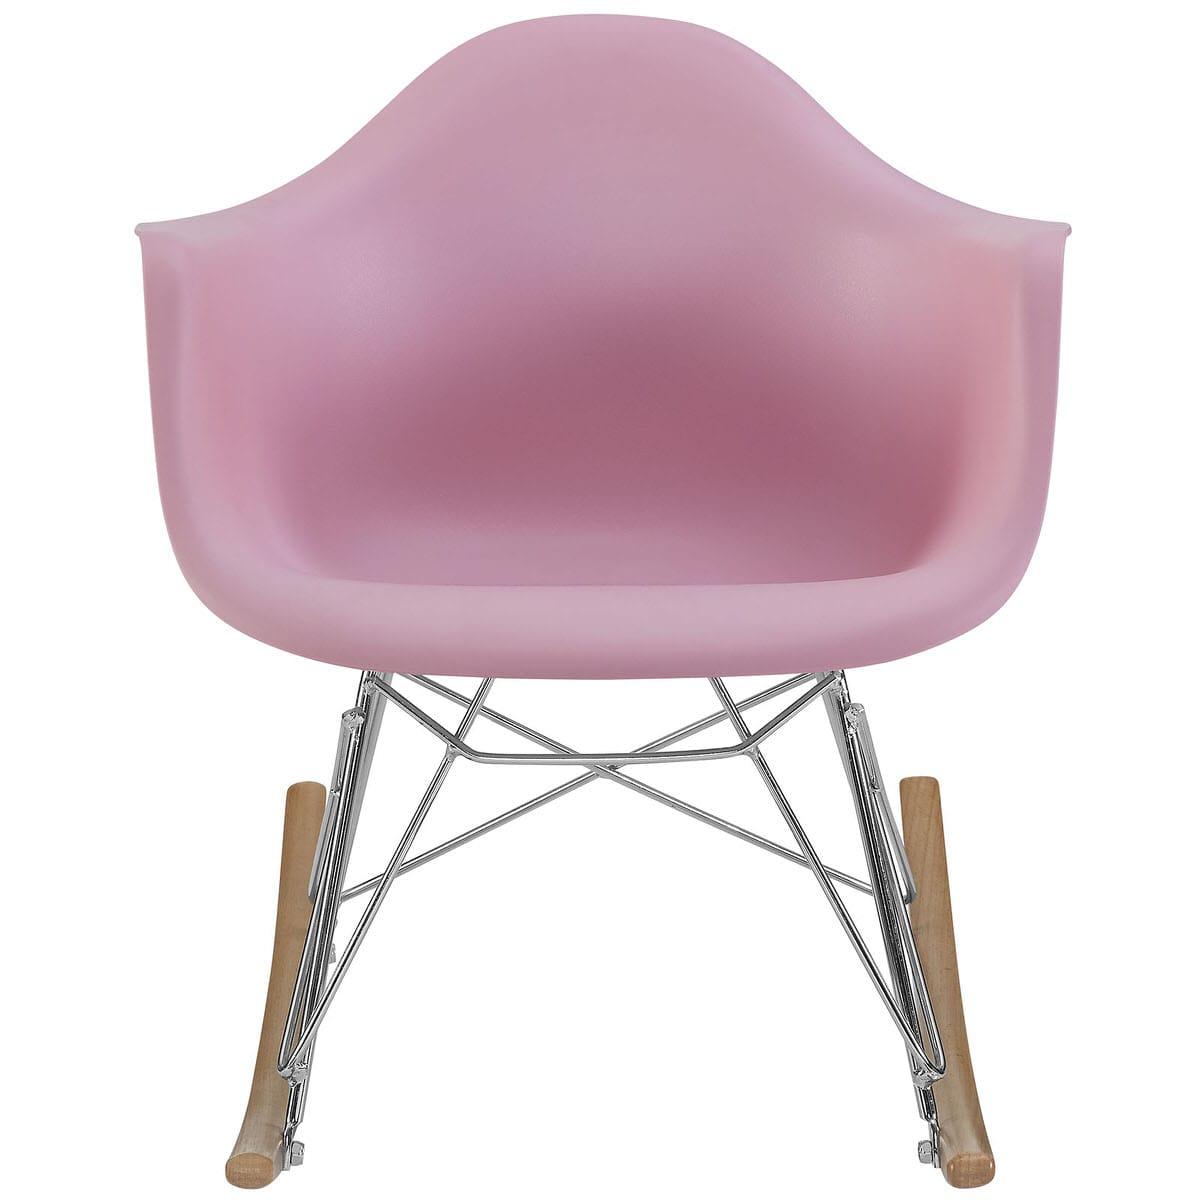 Enjoyable Rocker Kids Chair Pink By Modern Living Dailytribune Chair Design For Home Dailytribuneorg